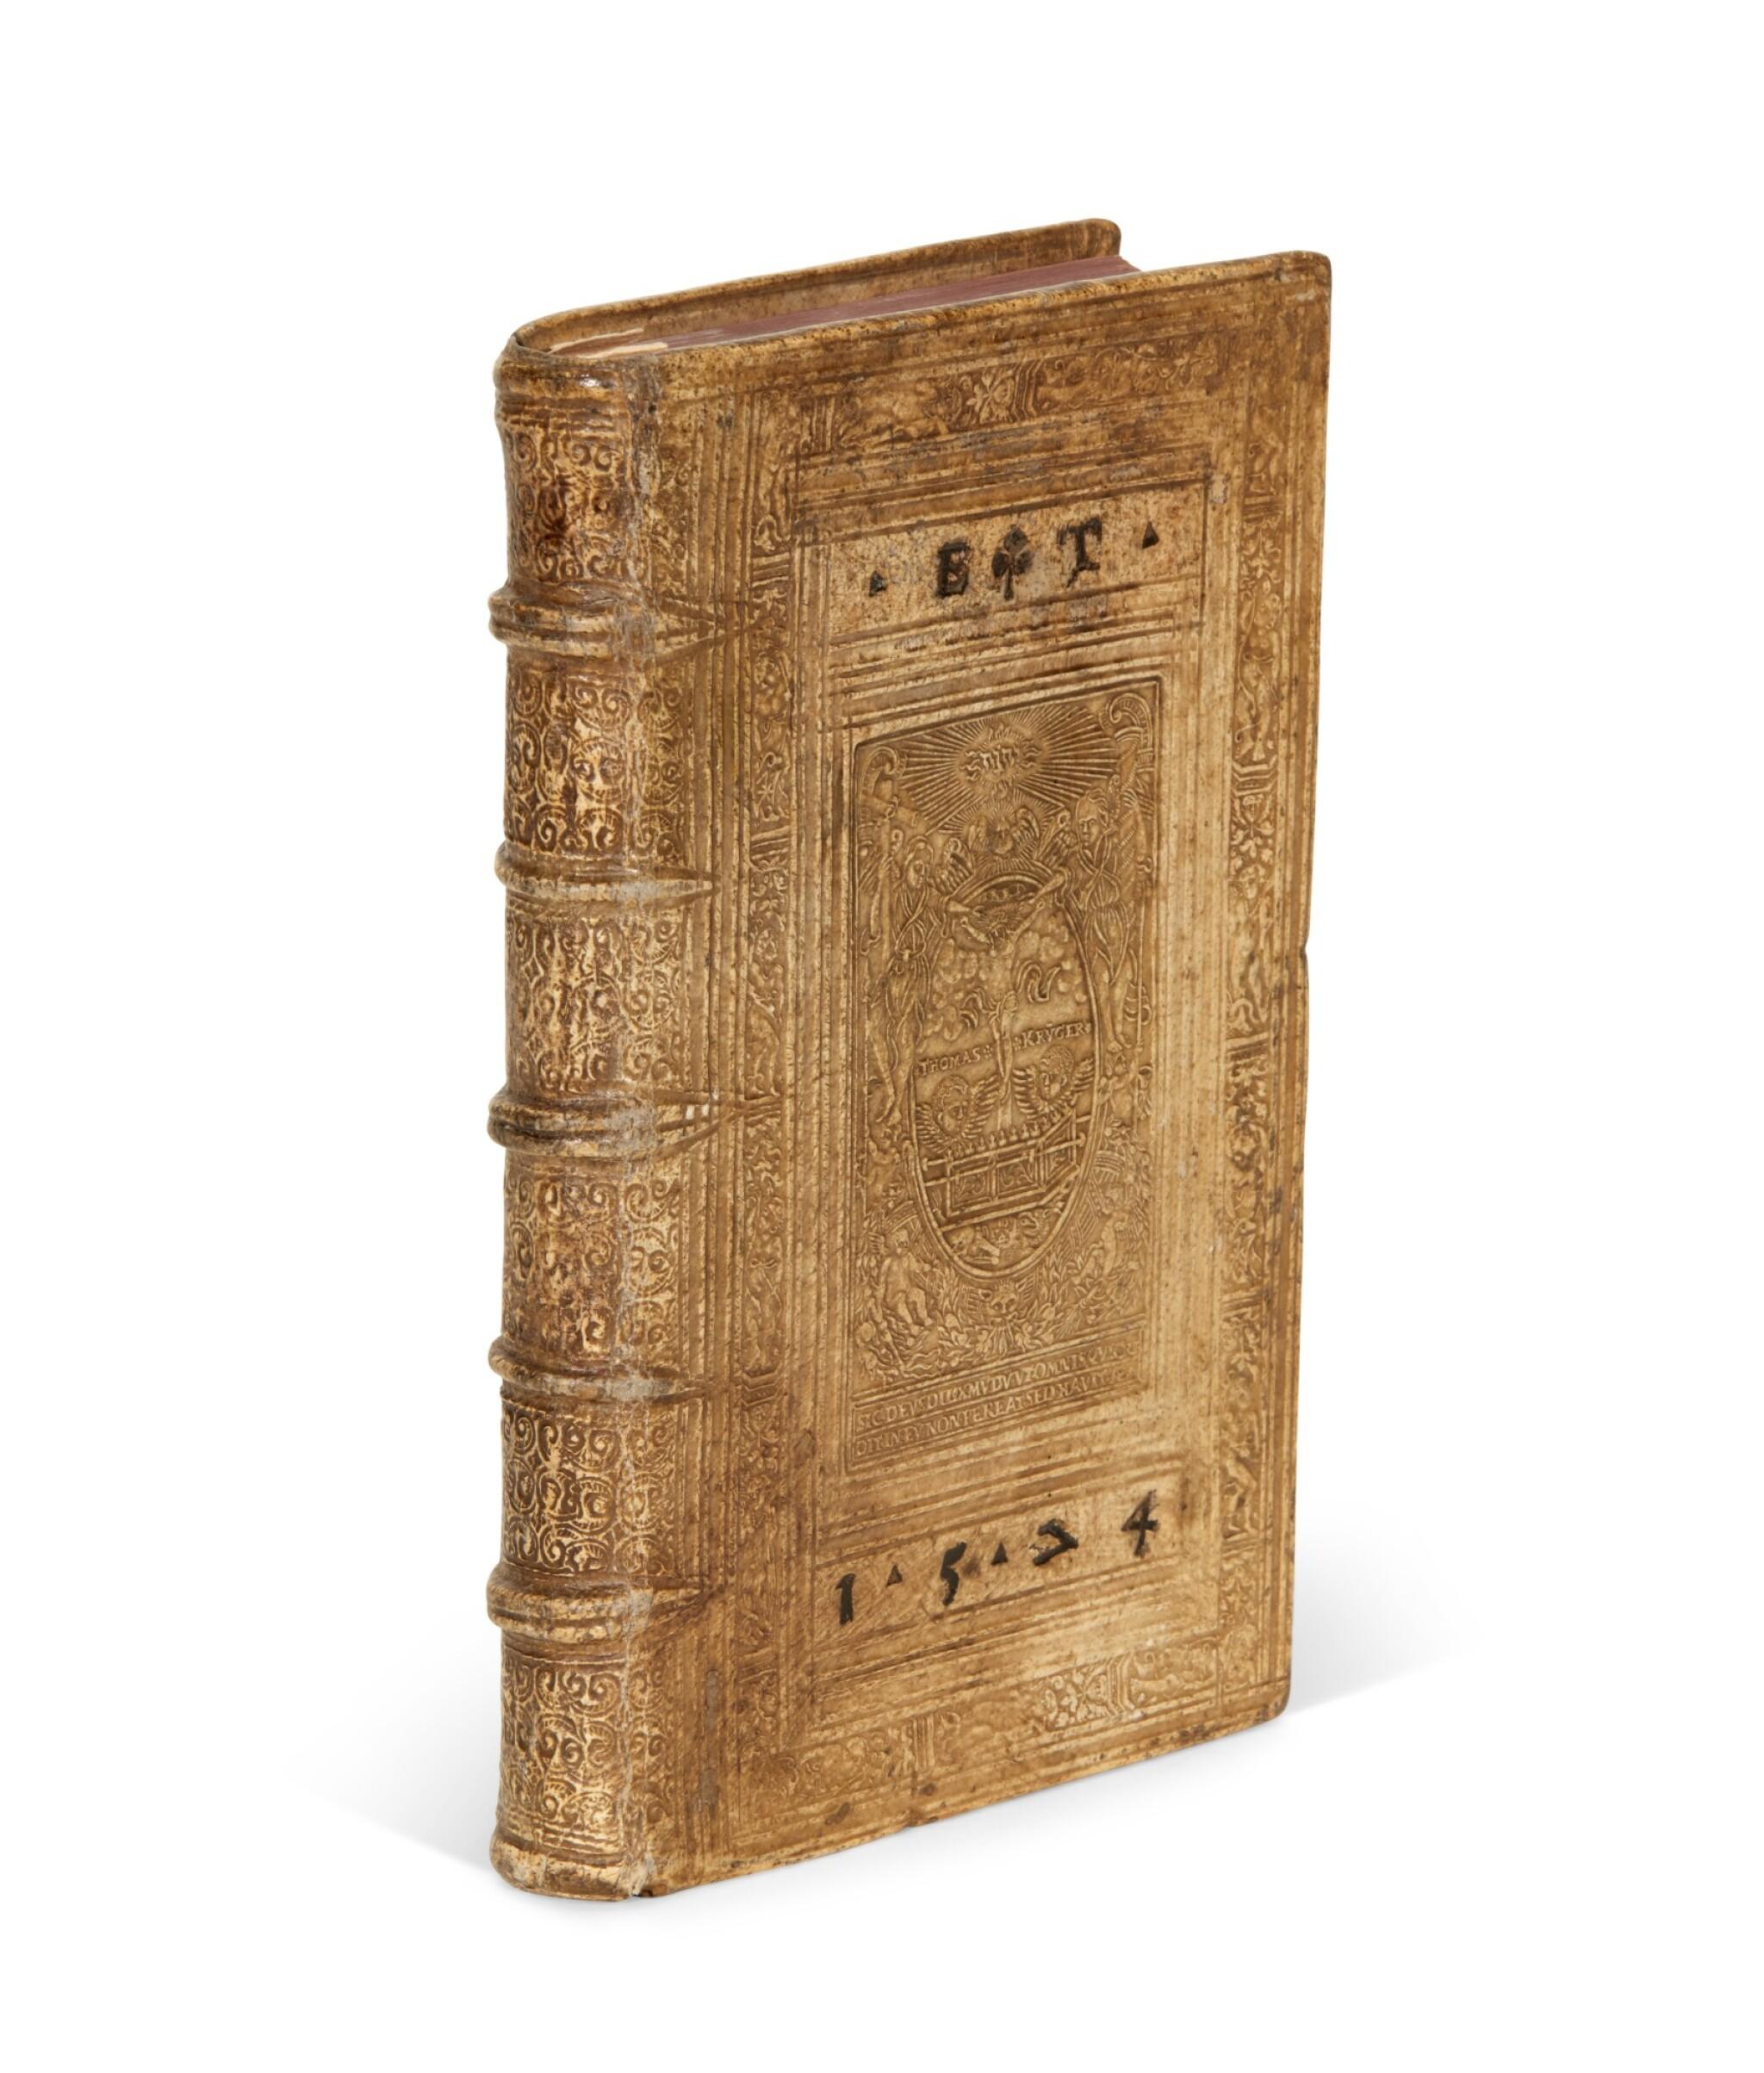 View full screen - View 1 of Lot 232. Serres, II. Partis commentariorum de statu religionis, [Geneva], 1573, pigskin binding by Thomas Krüger.